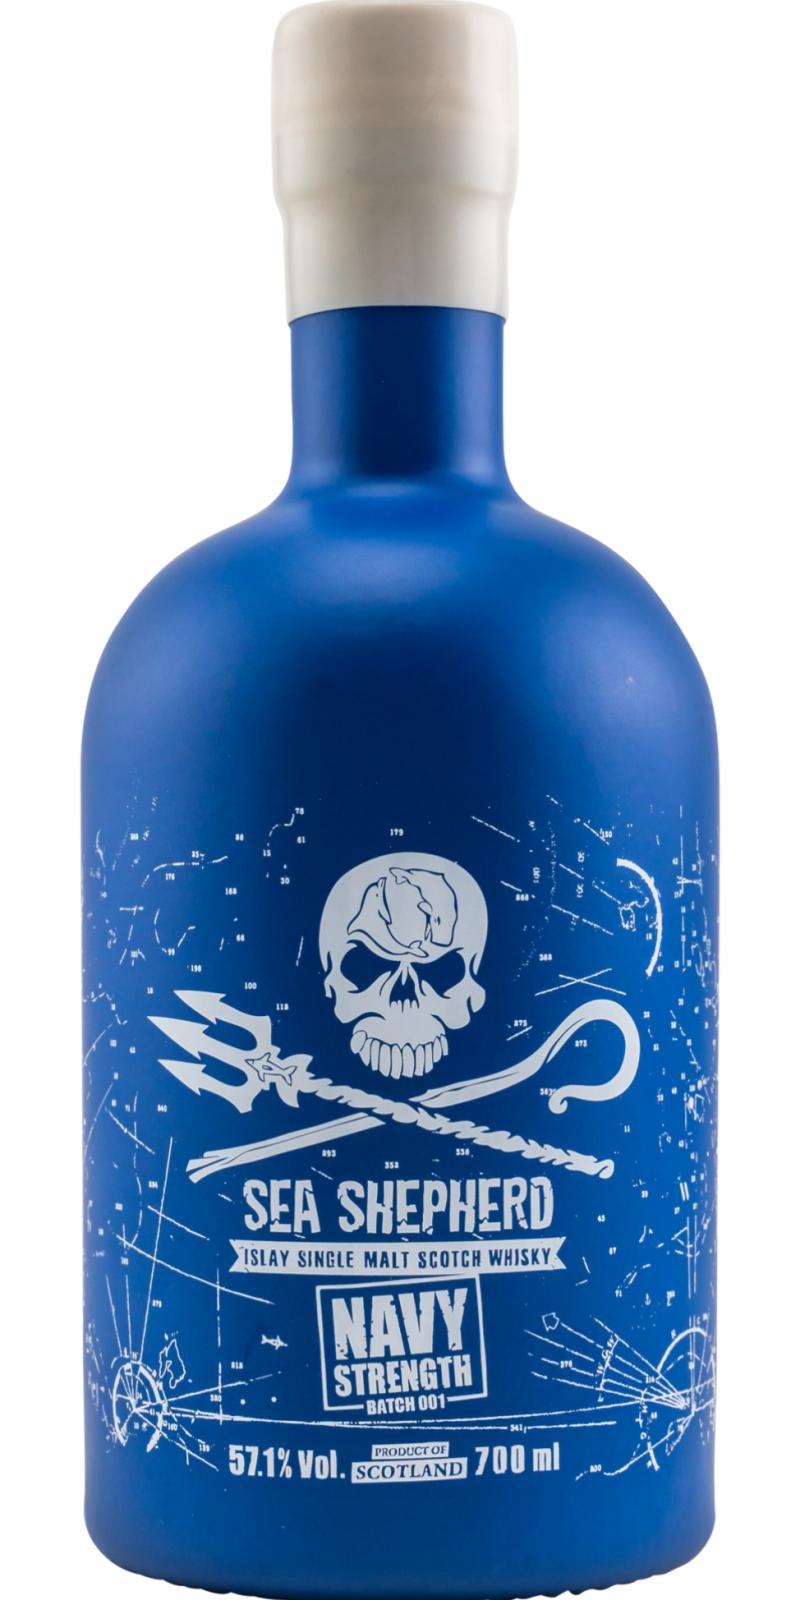 Islay Single Malt Scotch Whisky Sea Shepherd